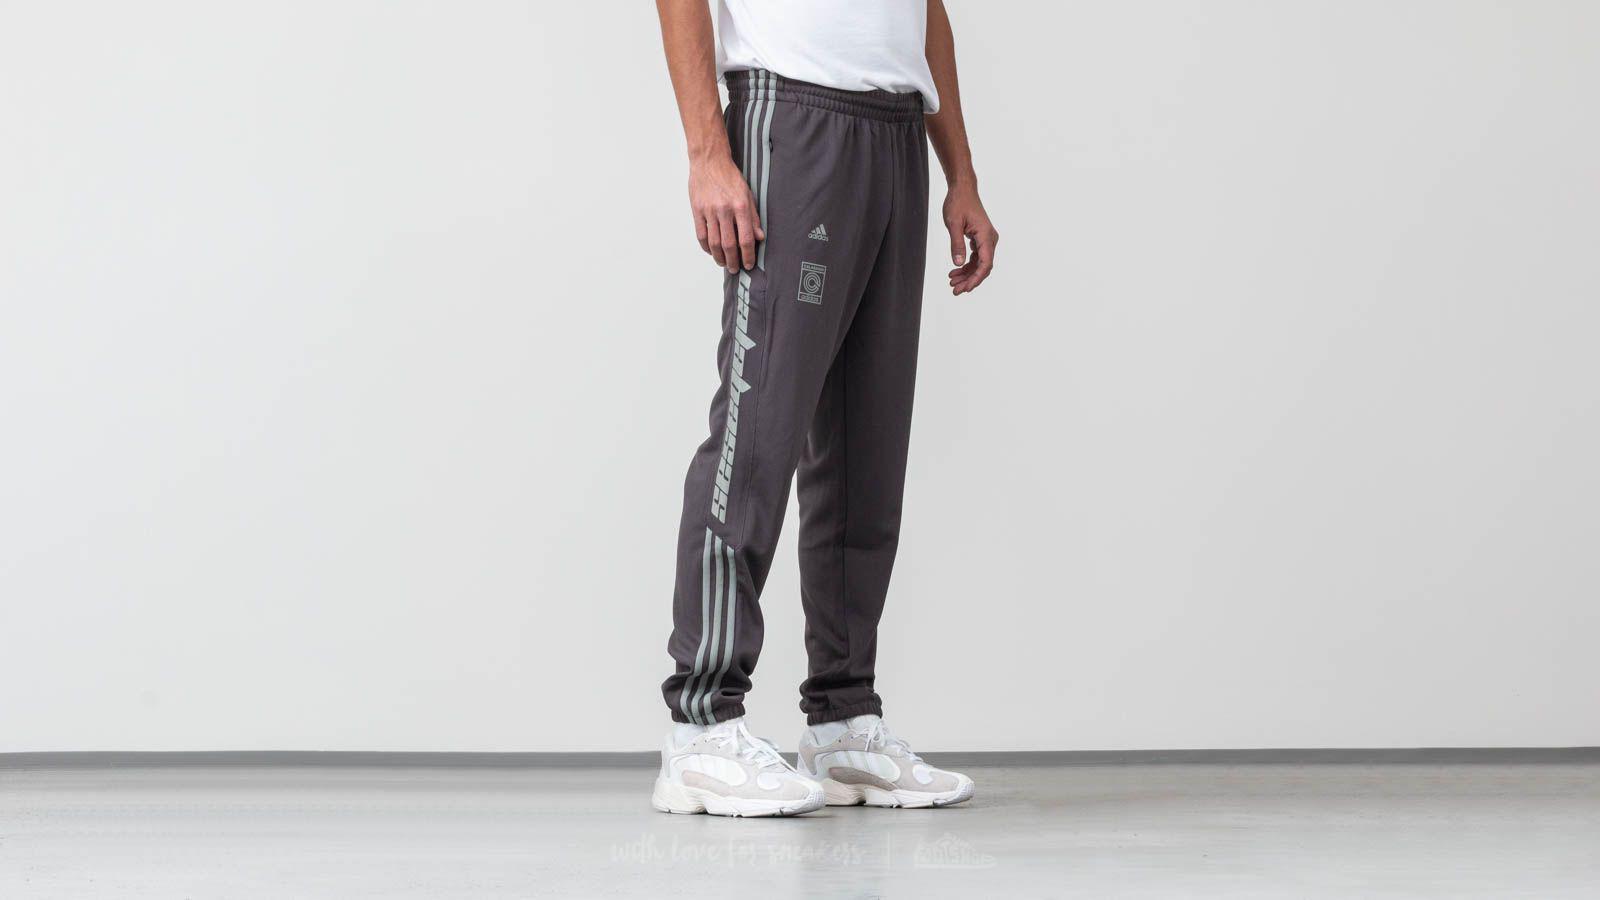 48bff592e Lyst - adidas Originals Adidas Calabasas Track Pants Ink  Wolves for Men